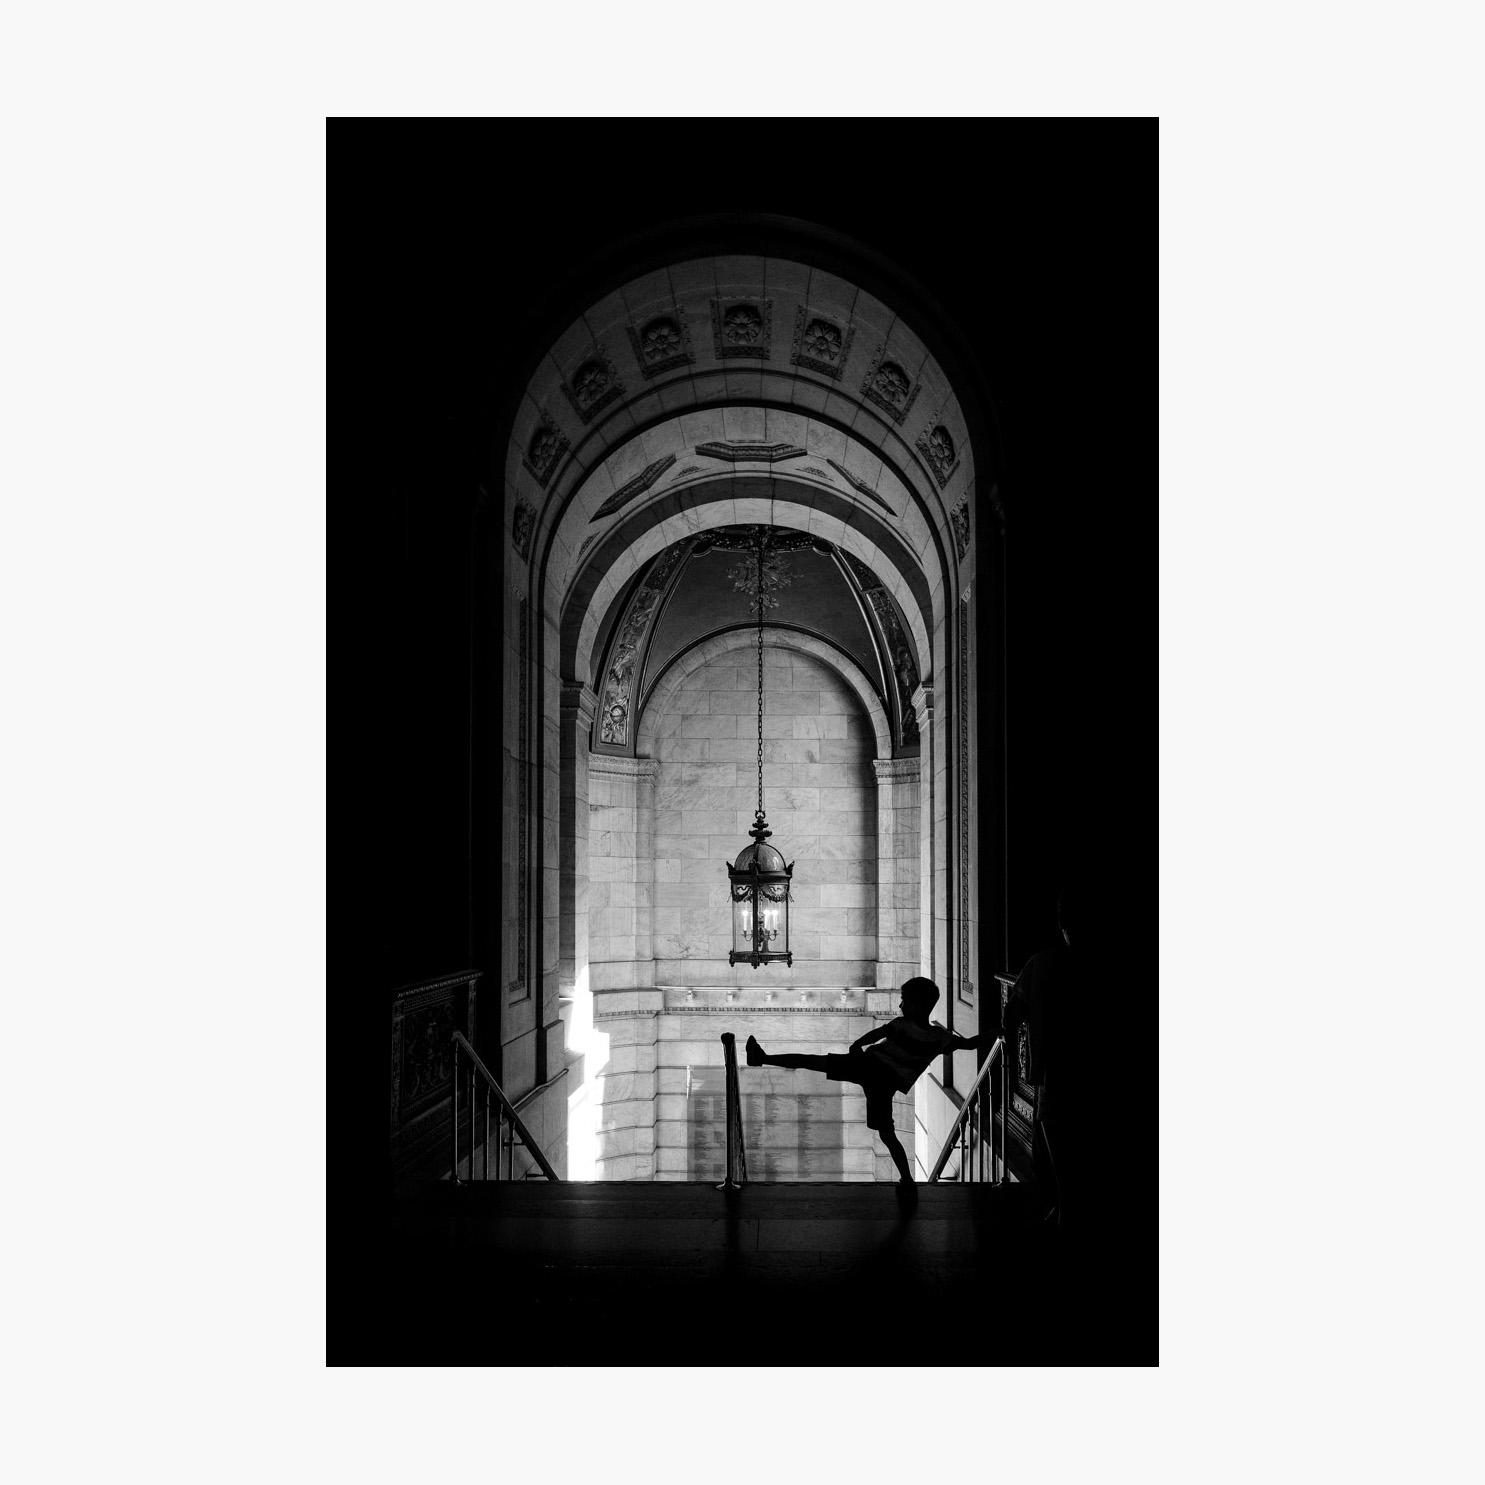 ©-2018-Harry-W-Edmonds-London-Photographer-Photographers-Note-Making-the-Shot-PN01.jpg